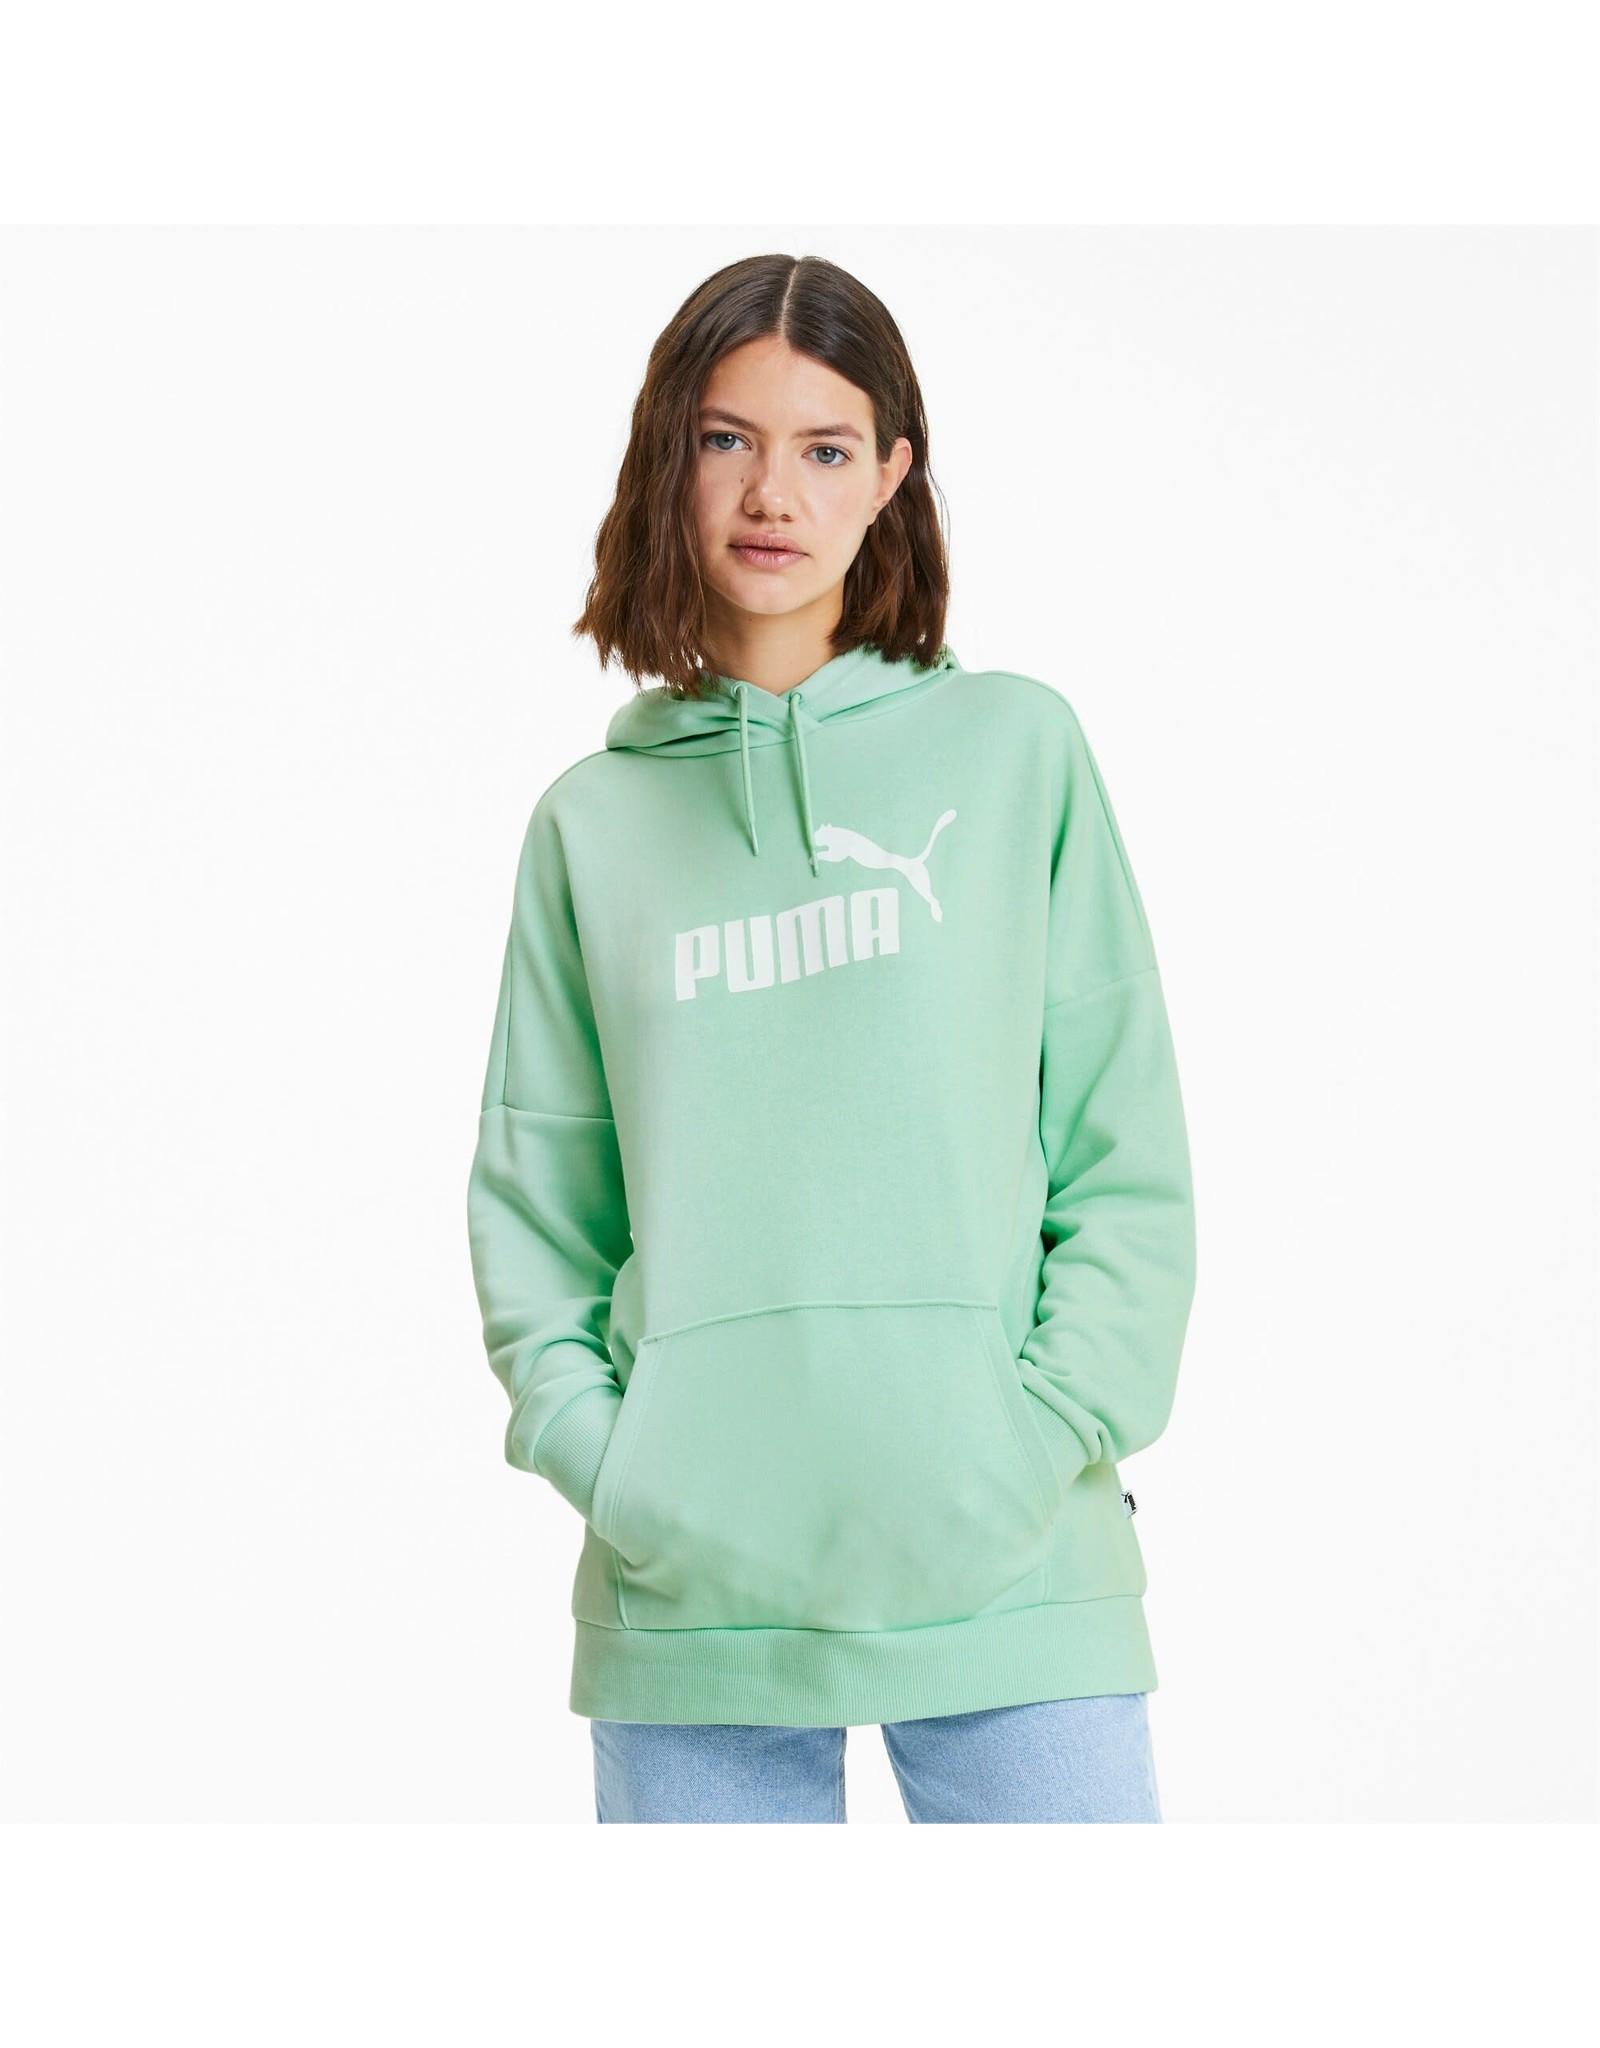 puma Puma - Ouaté Elongated Hoody Mist Green